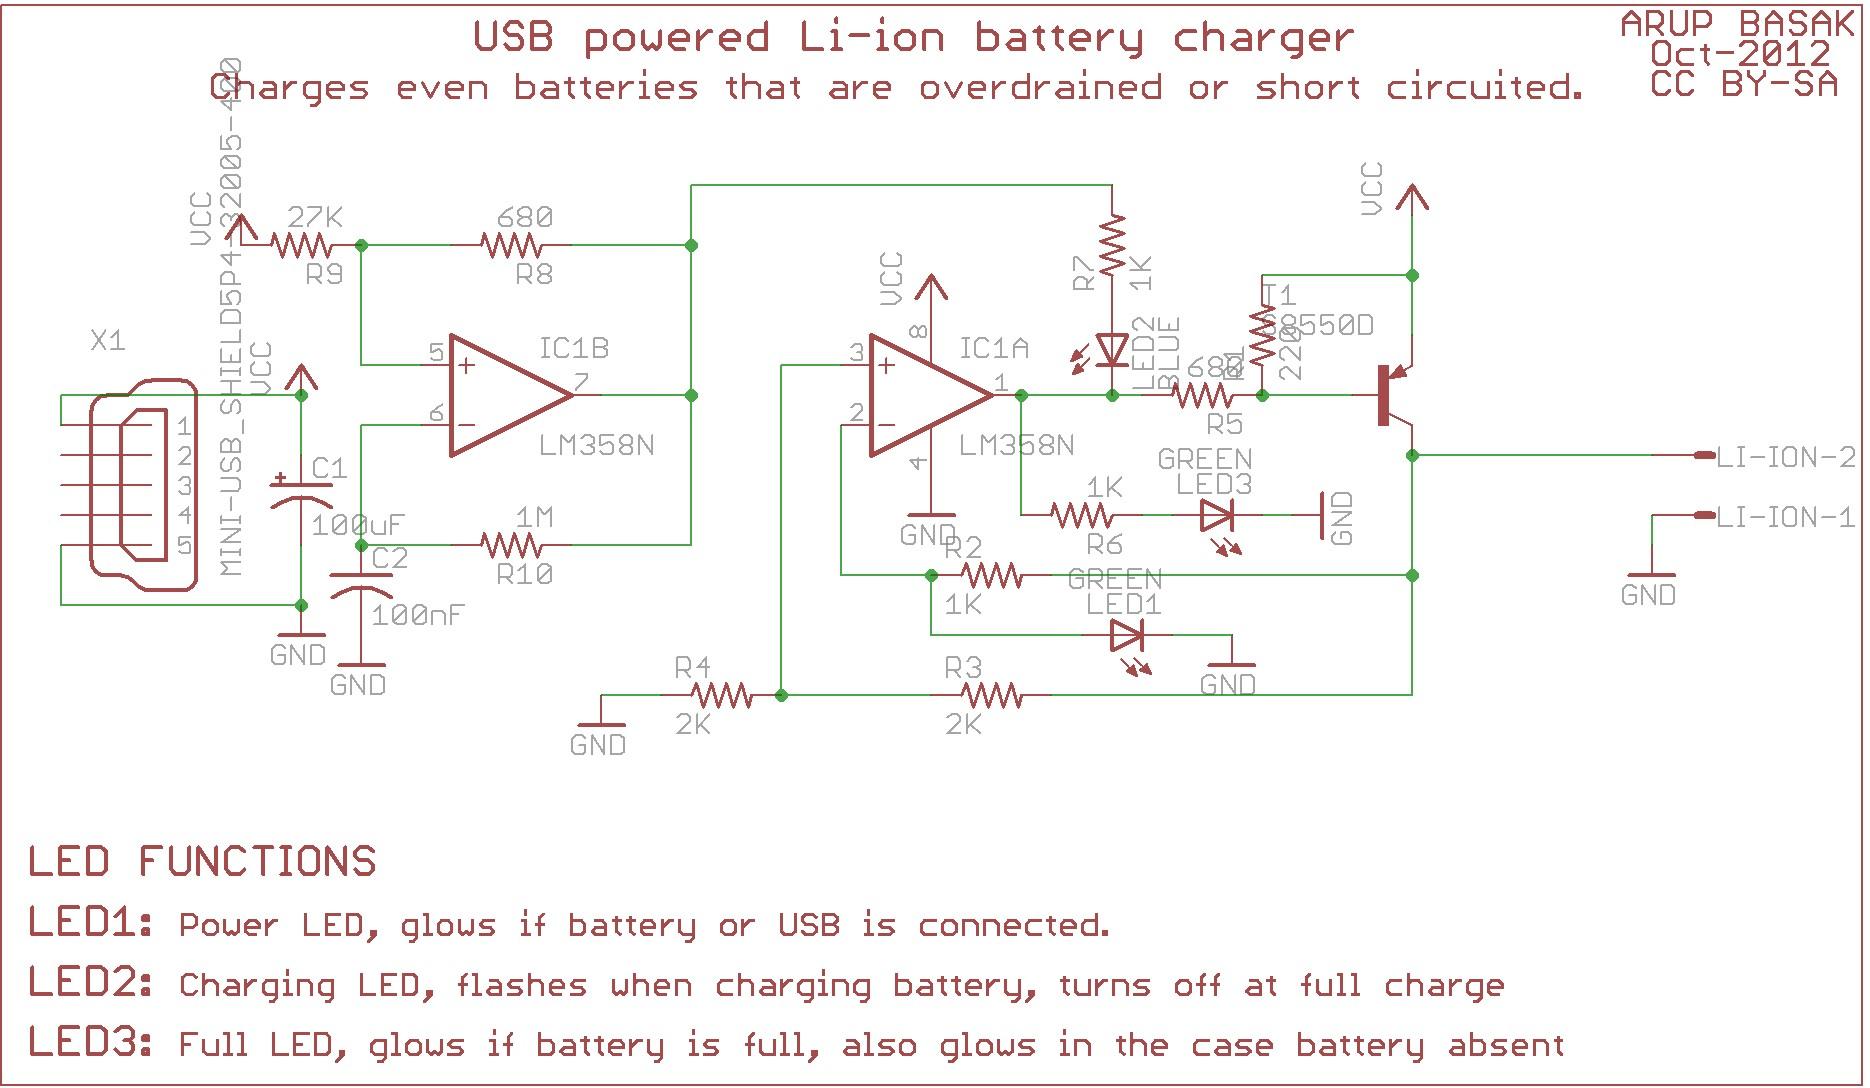 Car Battery Charger Circuit Diagram Usb Li Ion Charger Revision – Circuits Diy Of Car Battery Charger Circuit Diagram